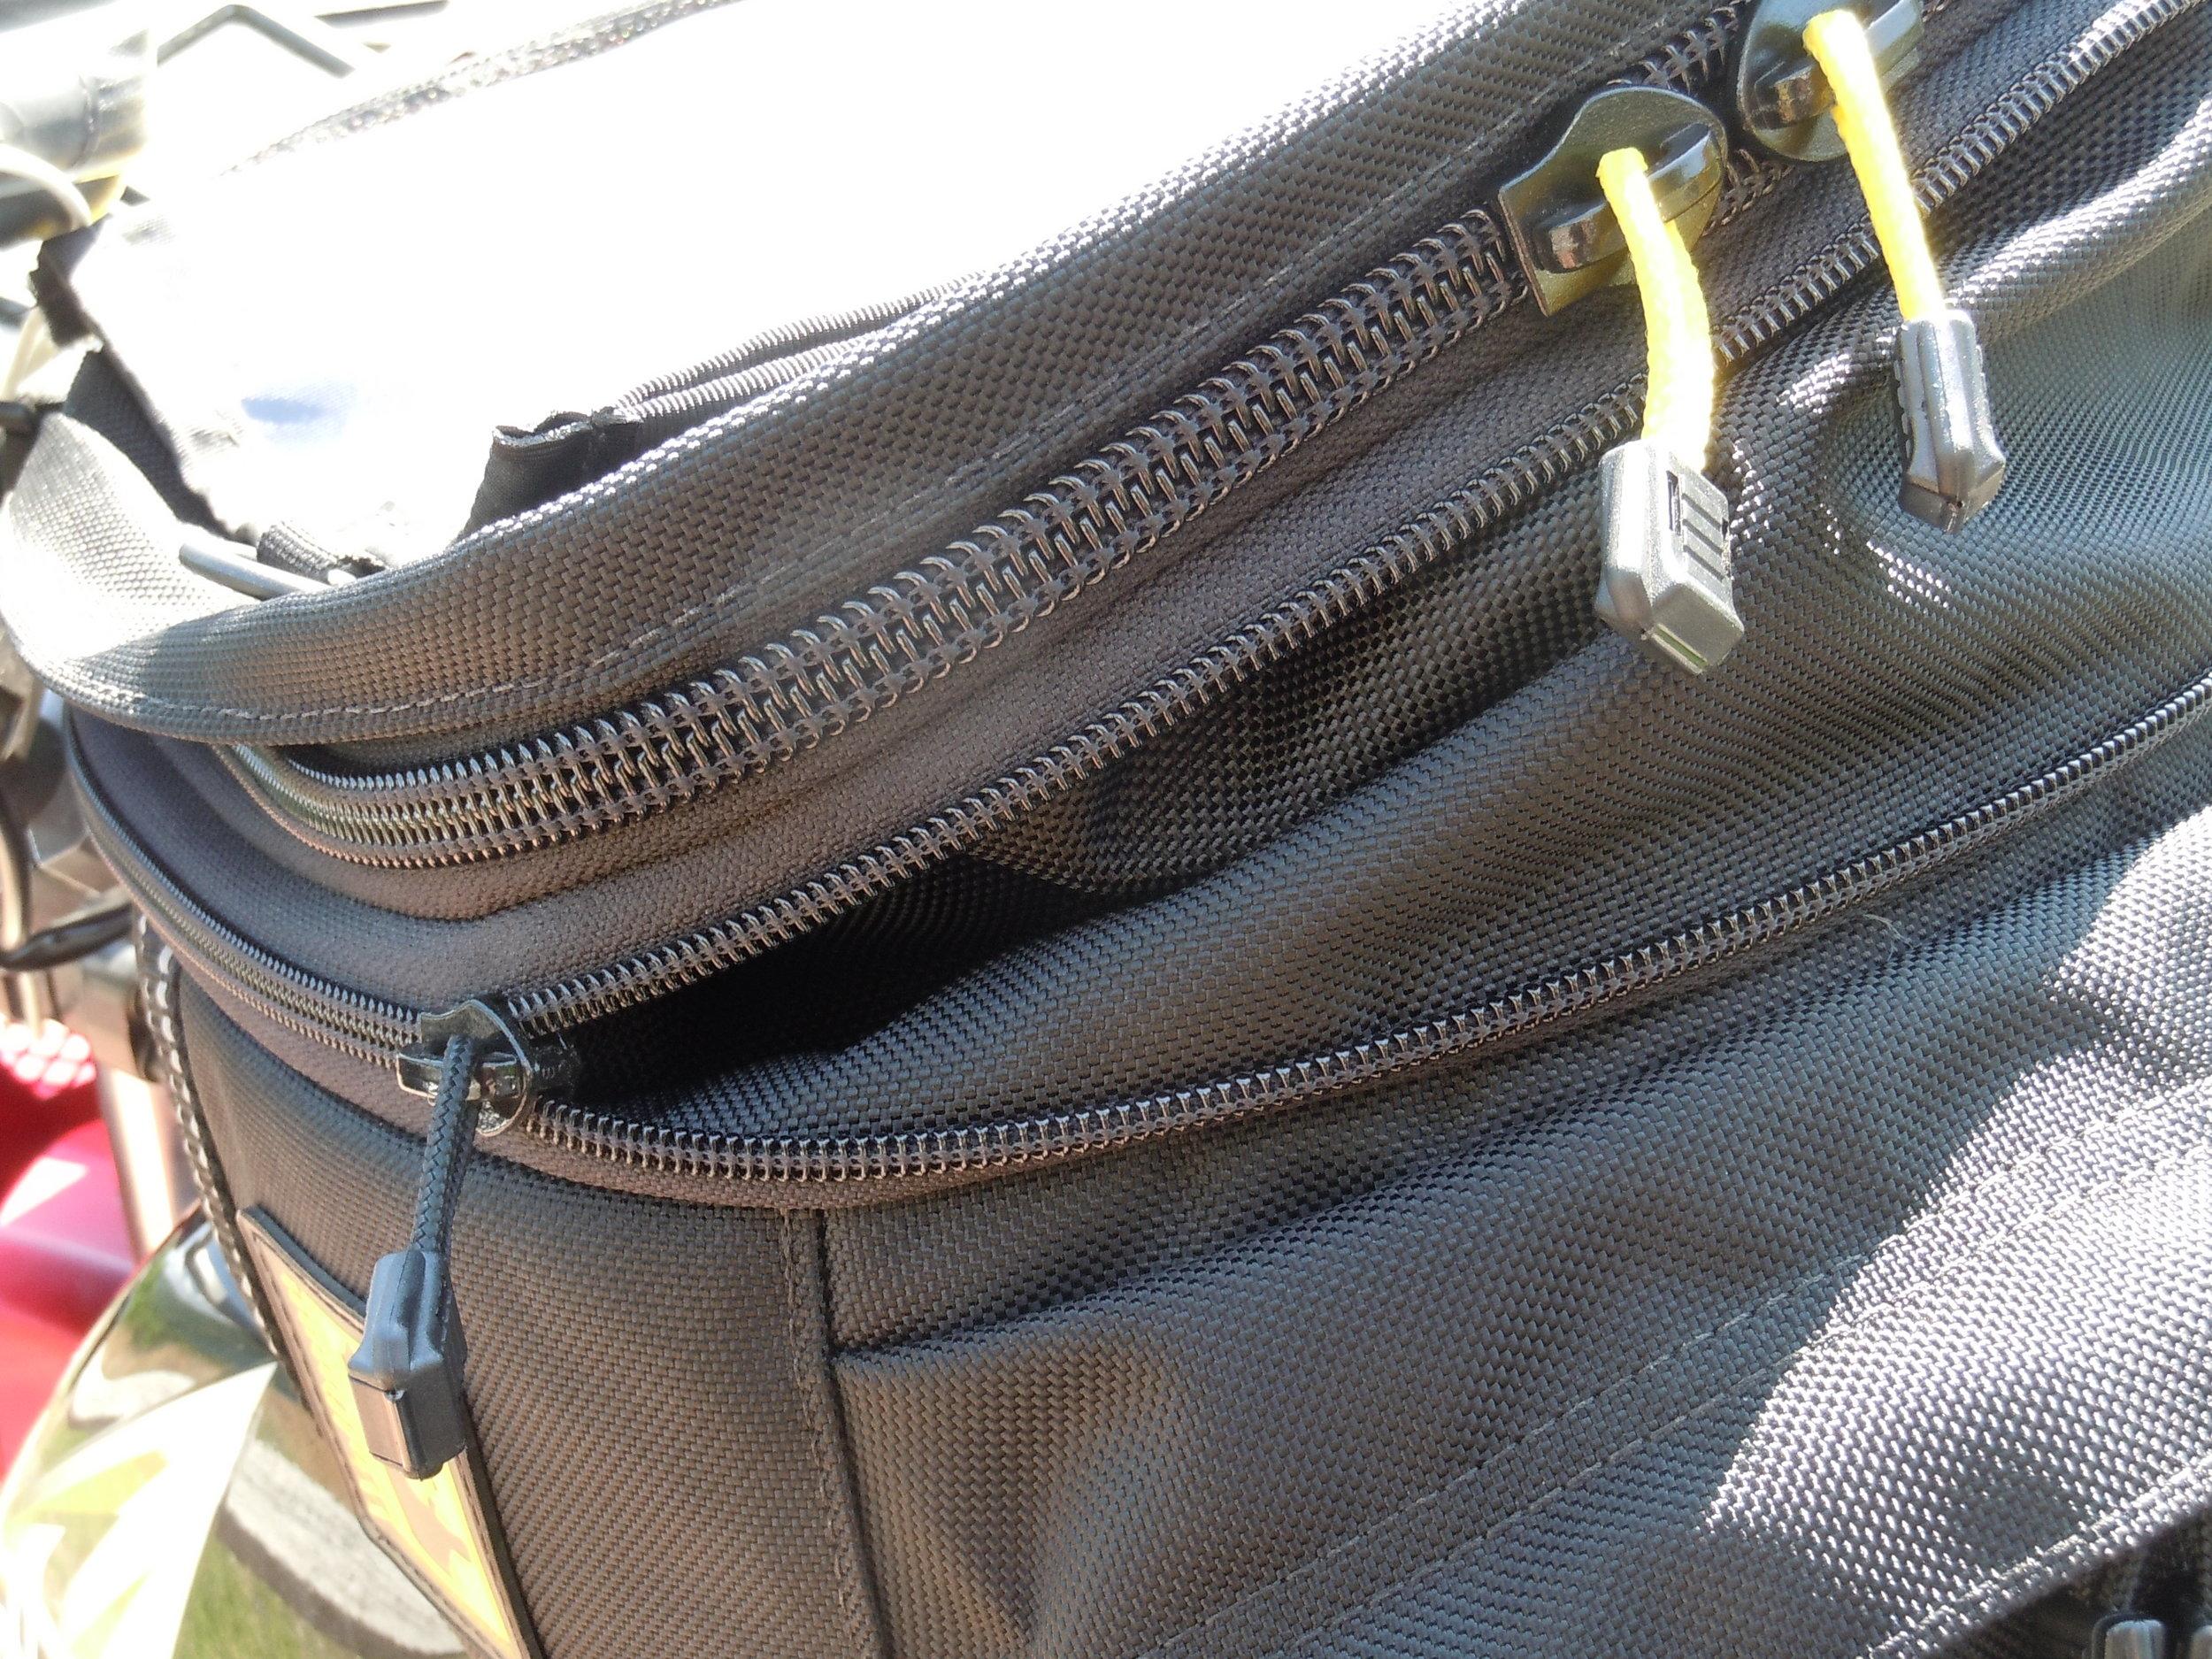 Yellow and Black Zipper Pulls